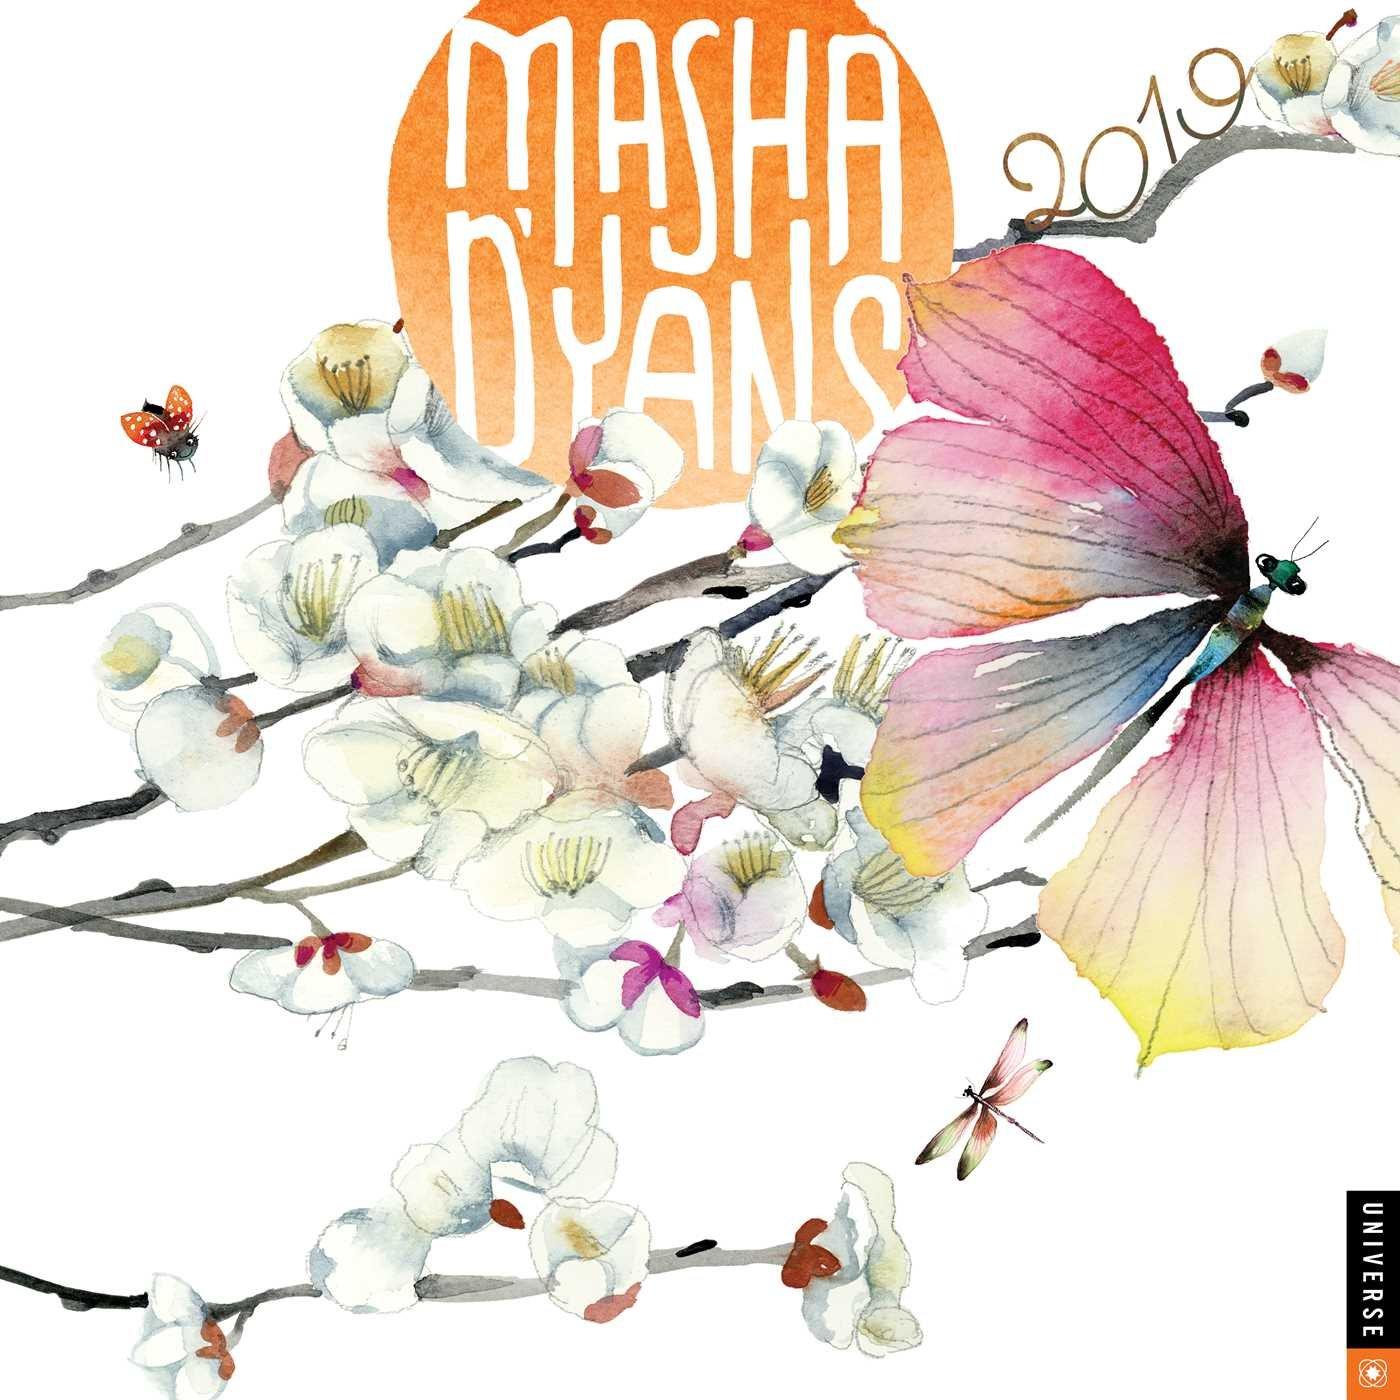 masha dyans 2019 wall calendar